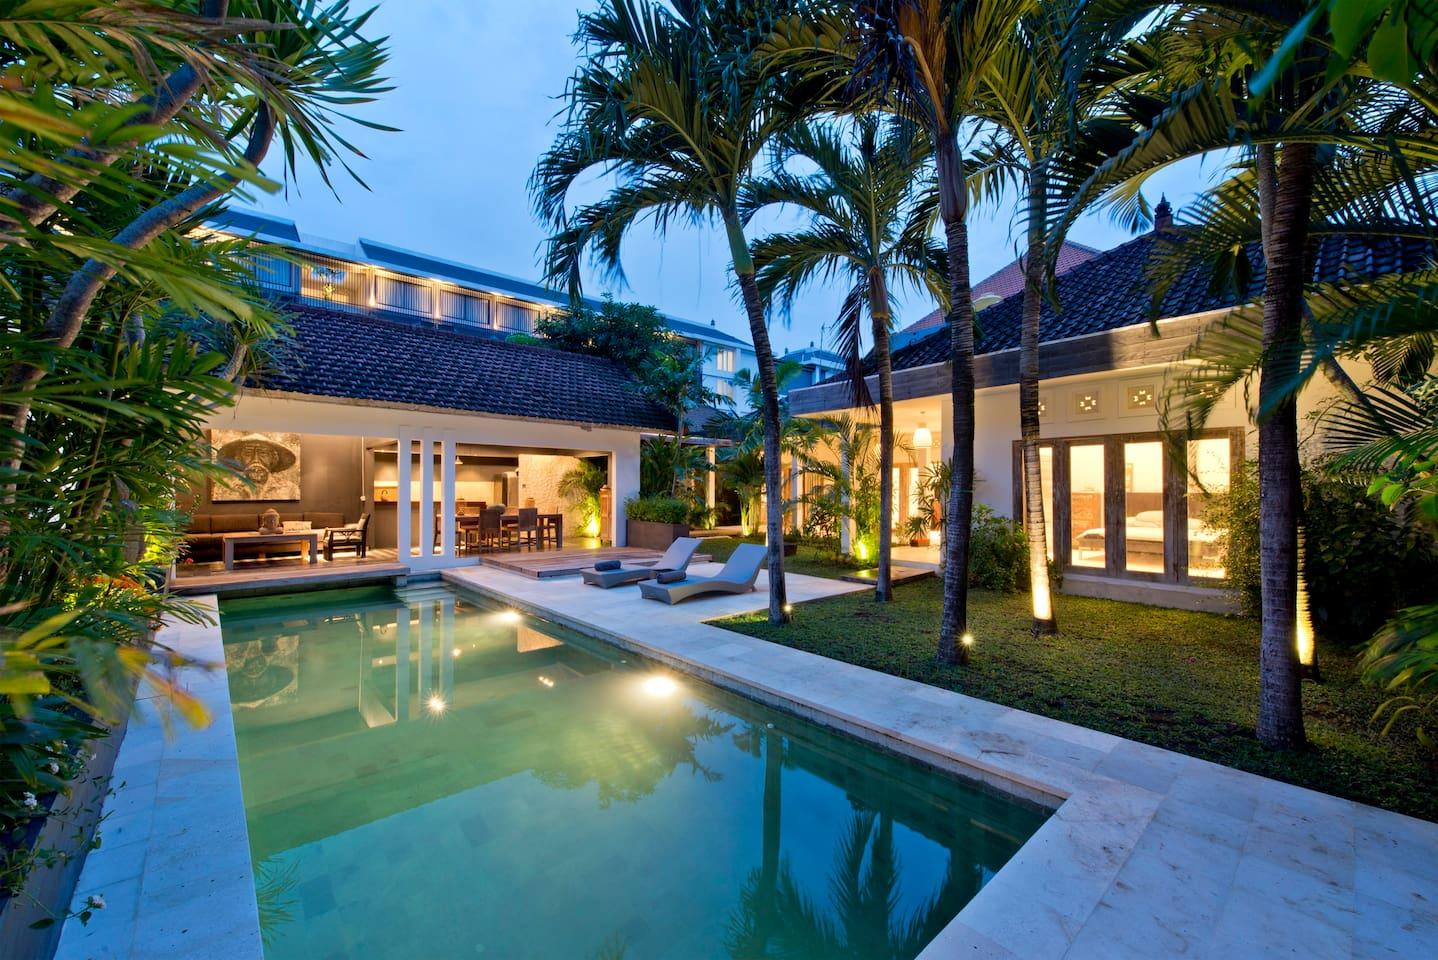 Beautiful Villa - Perfect Location - Houses for Rent in Kuta, Bali,  Indonesia